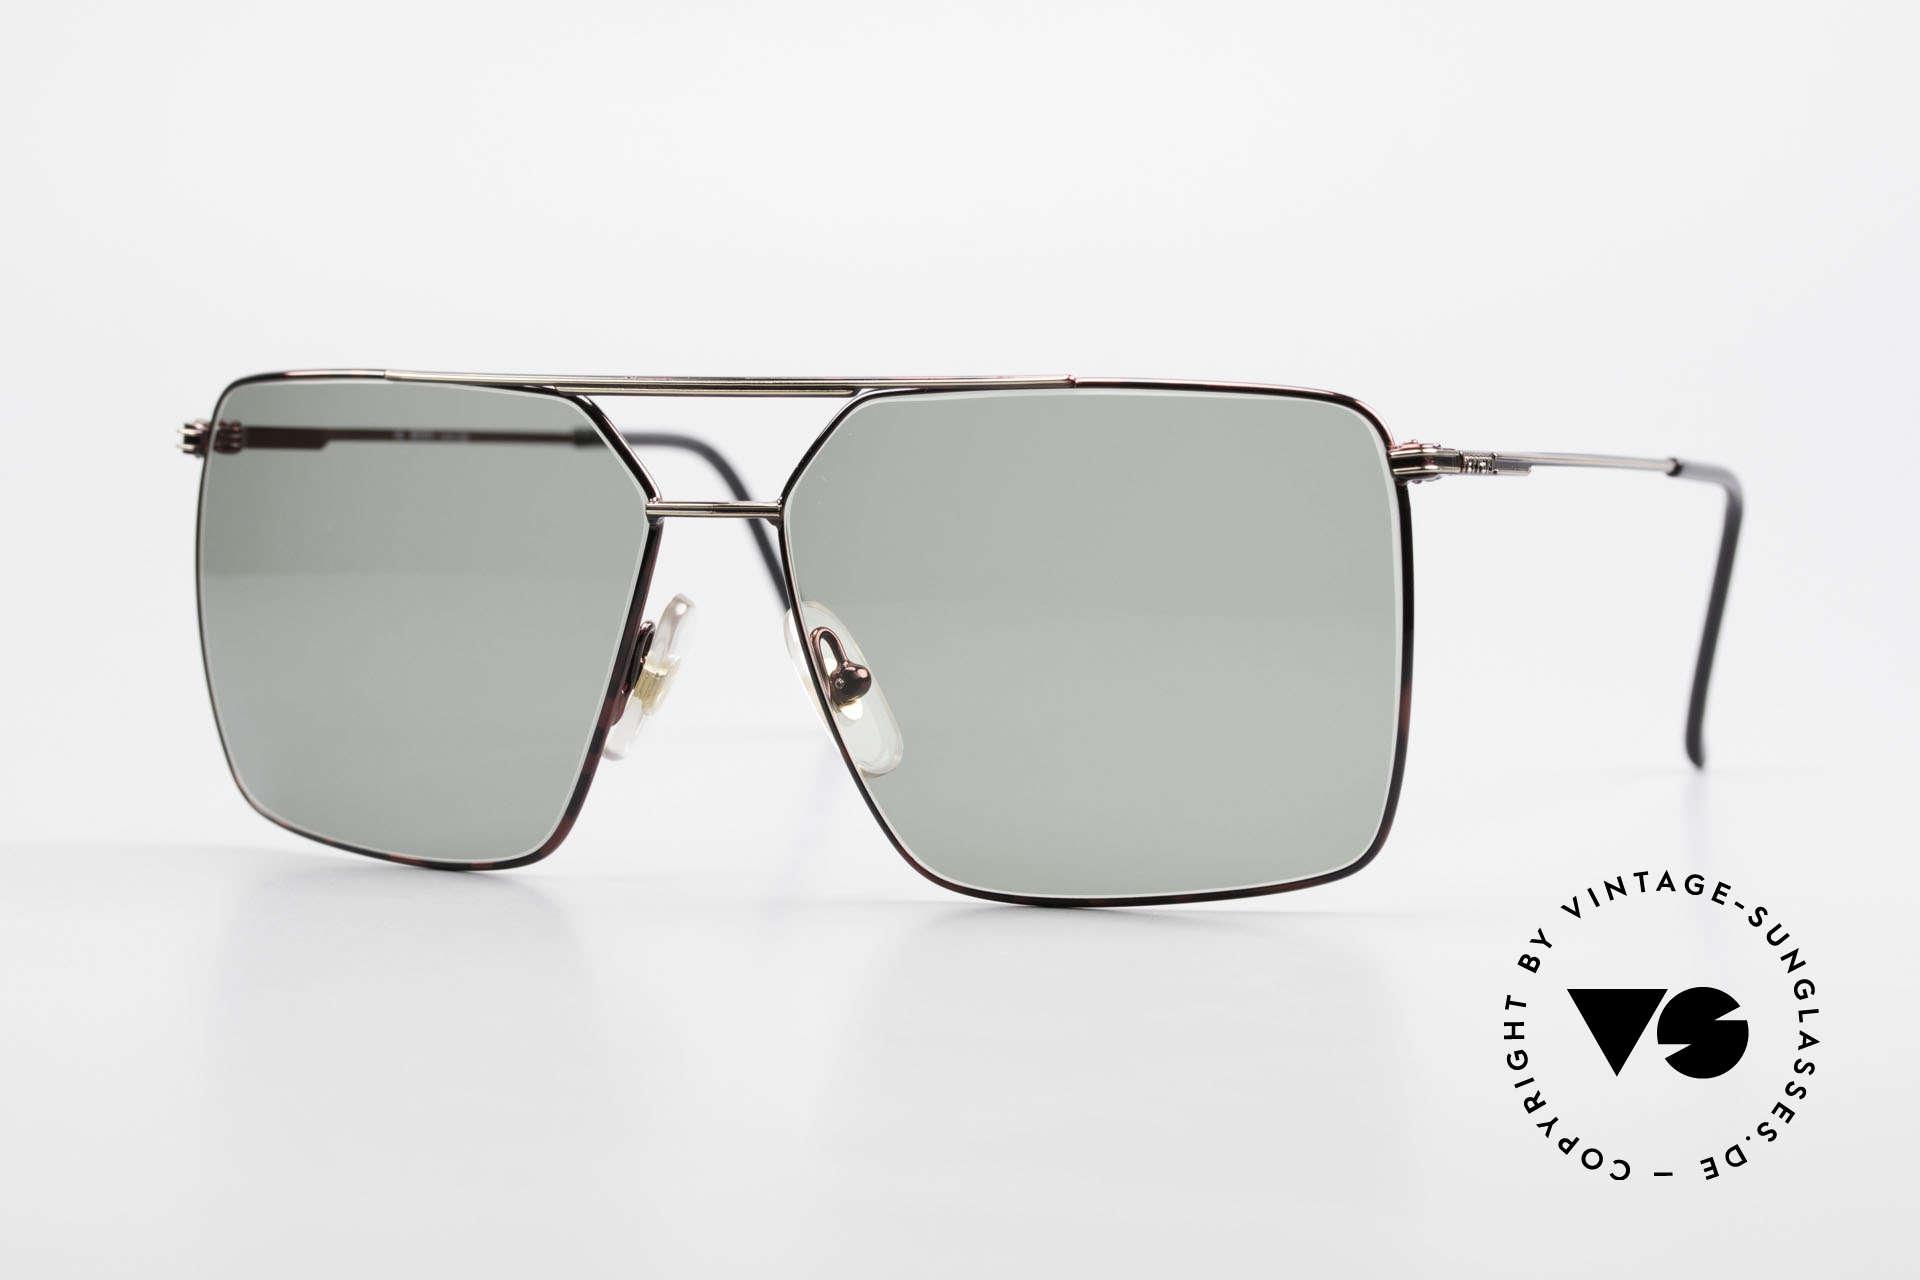 Ferrari F46 Ferrari Formula 1 Sunglasses, striking model of the FERRARI 'Formula 1' series, Made for Men